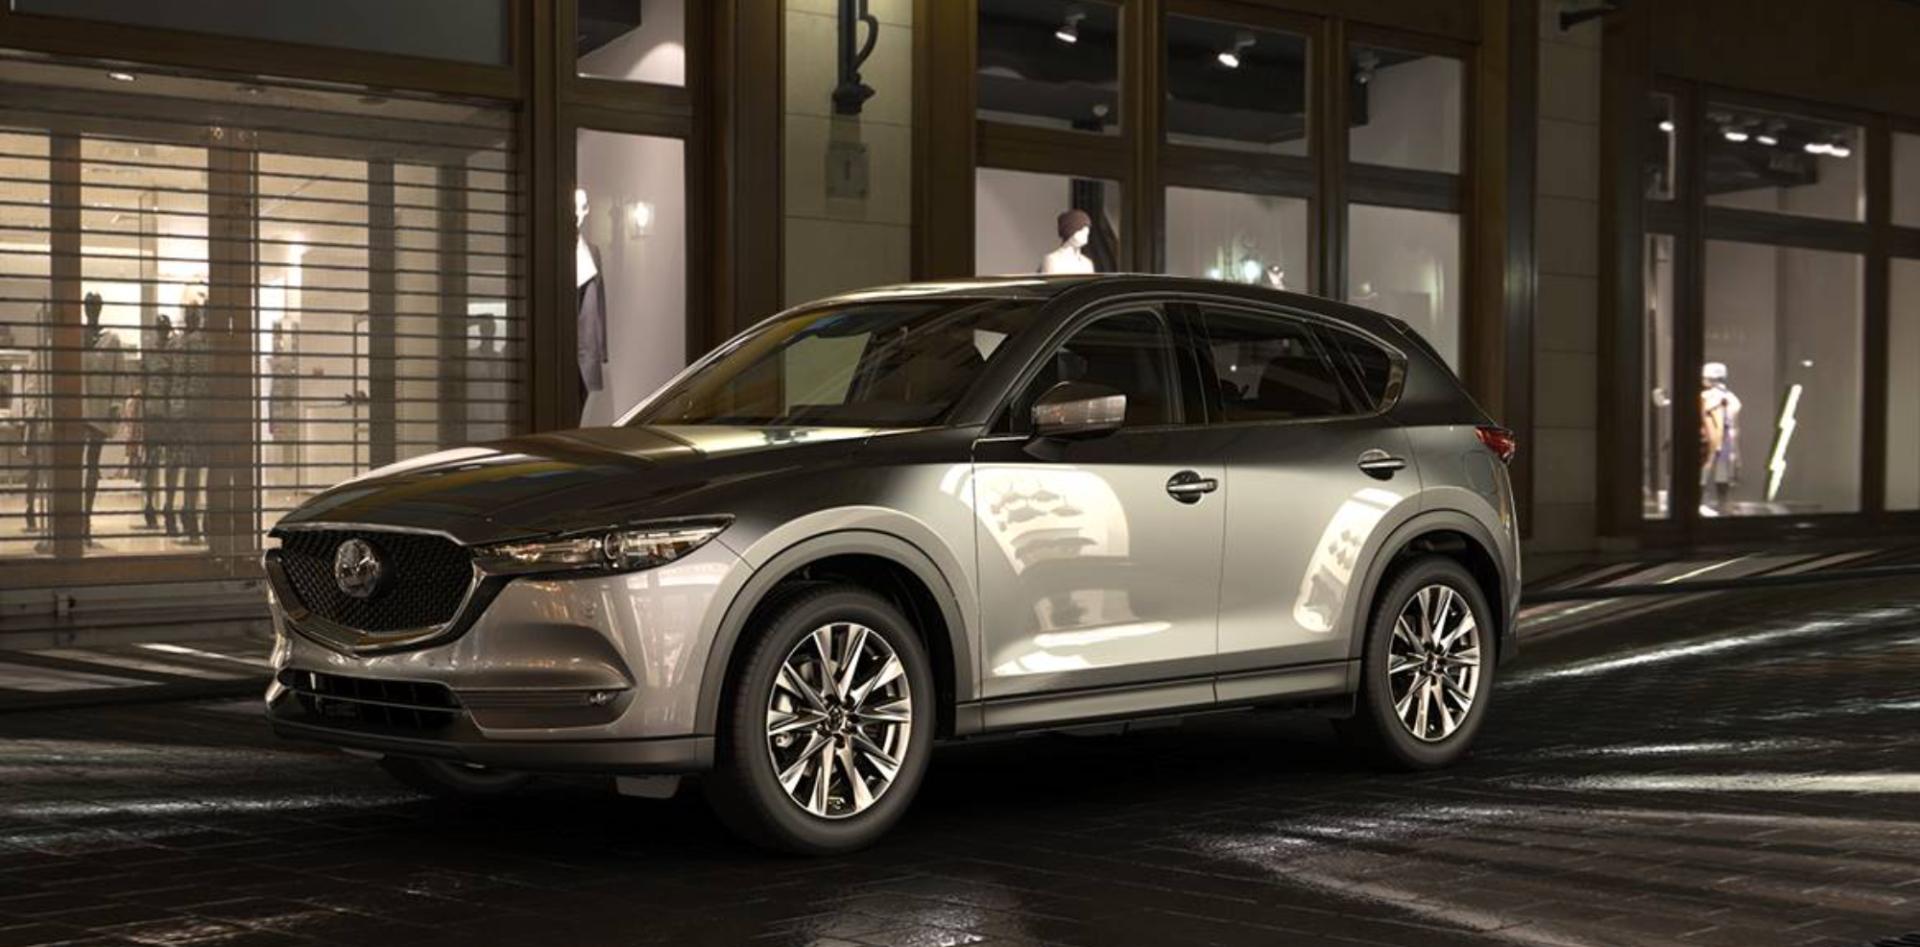 What Distinguishes A Signature? We Break Down The 2019 Mazda CX-5 Signature Differentiation